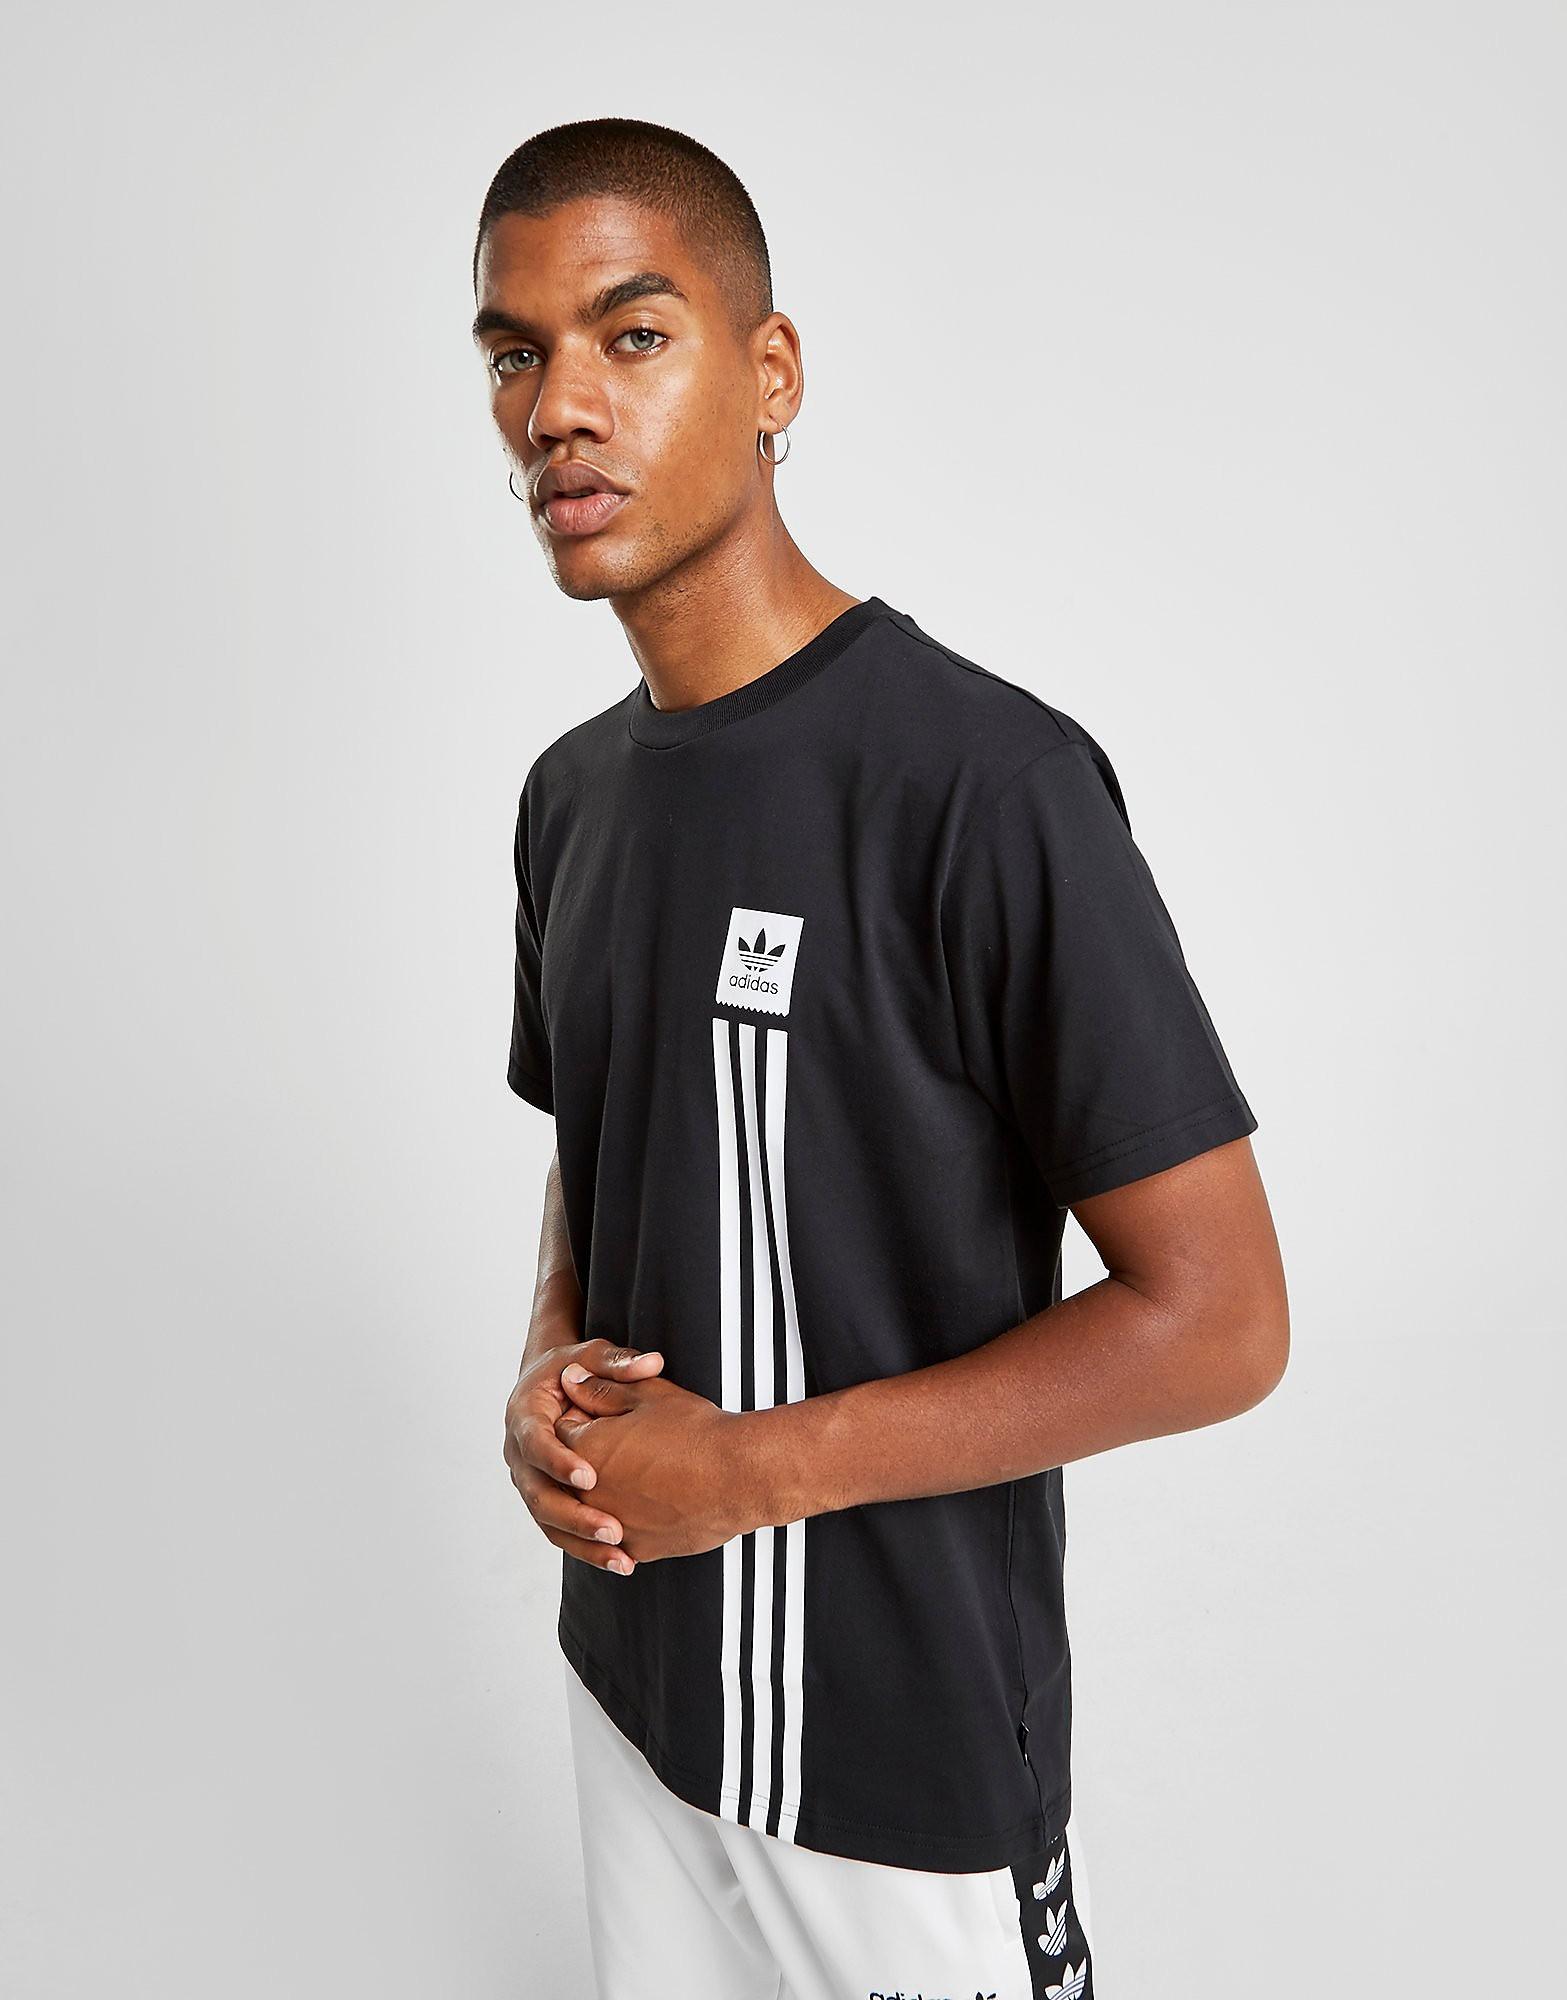 adidas Originals T-Shirt Manches Courtes Pillar Homme - Noir, Noir